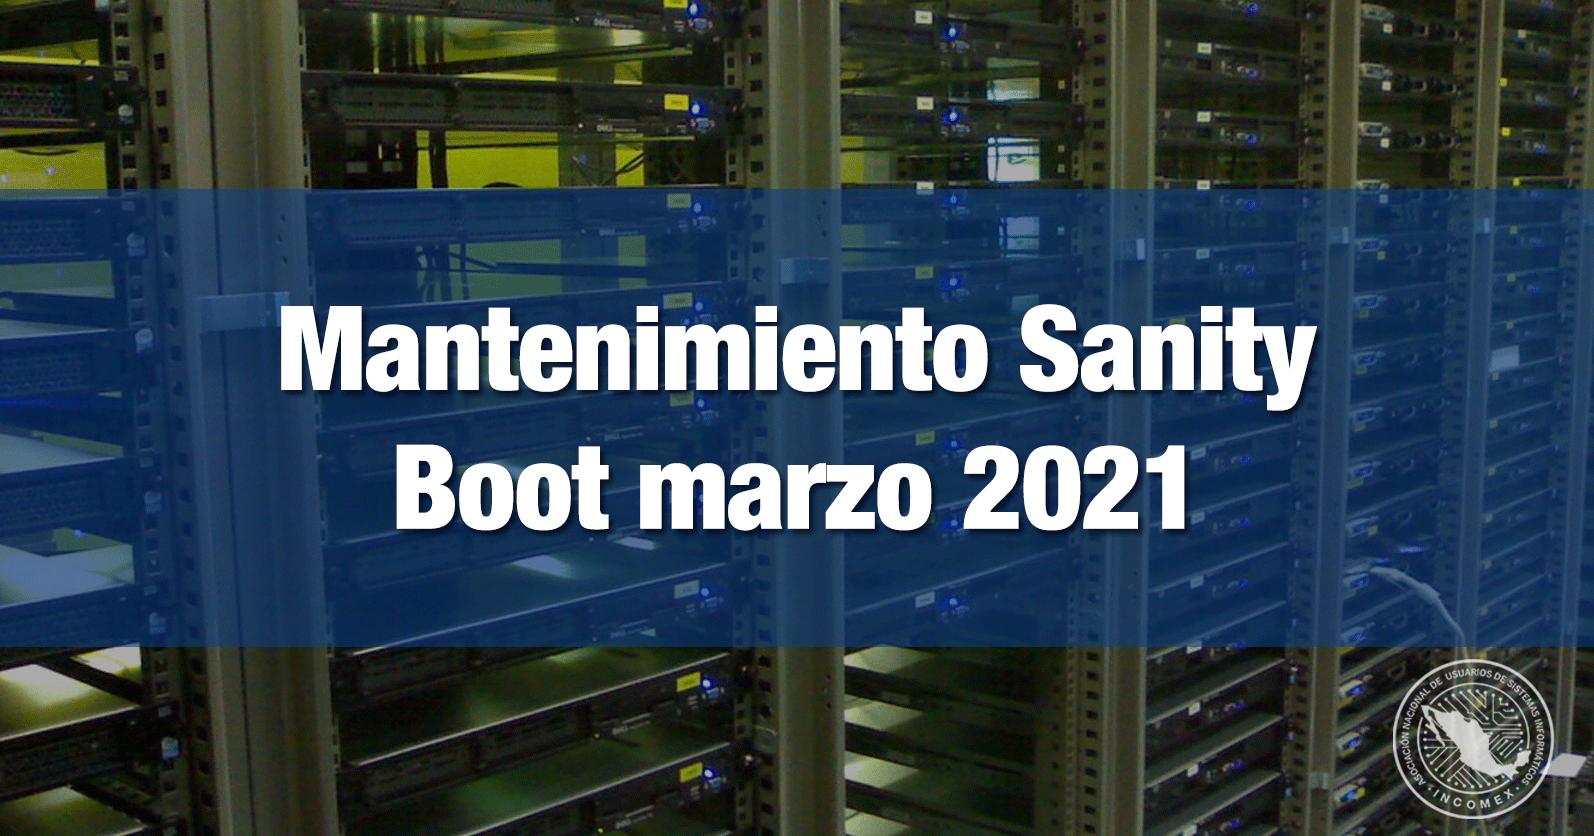 Mantenimiento Sanity Boot marzo 2021